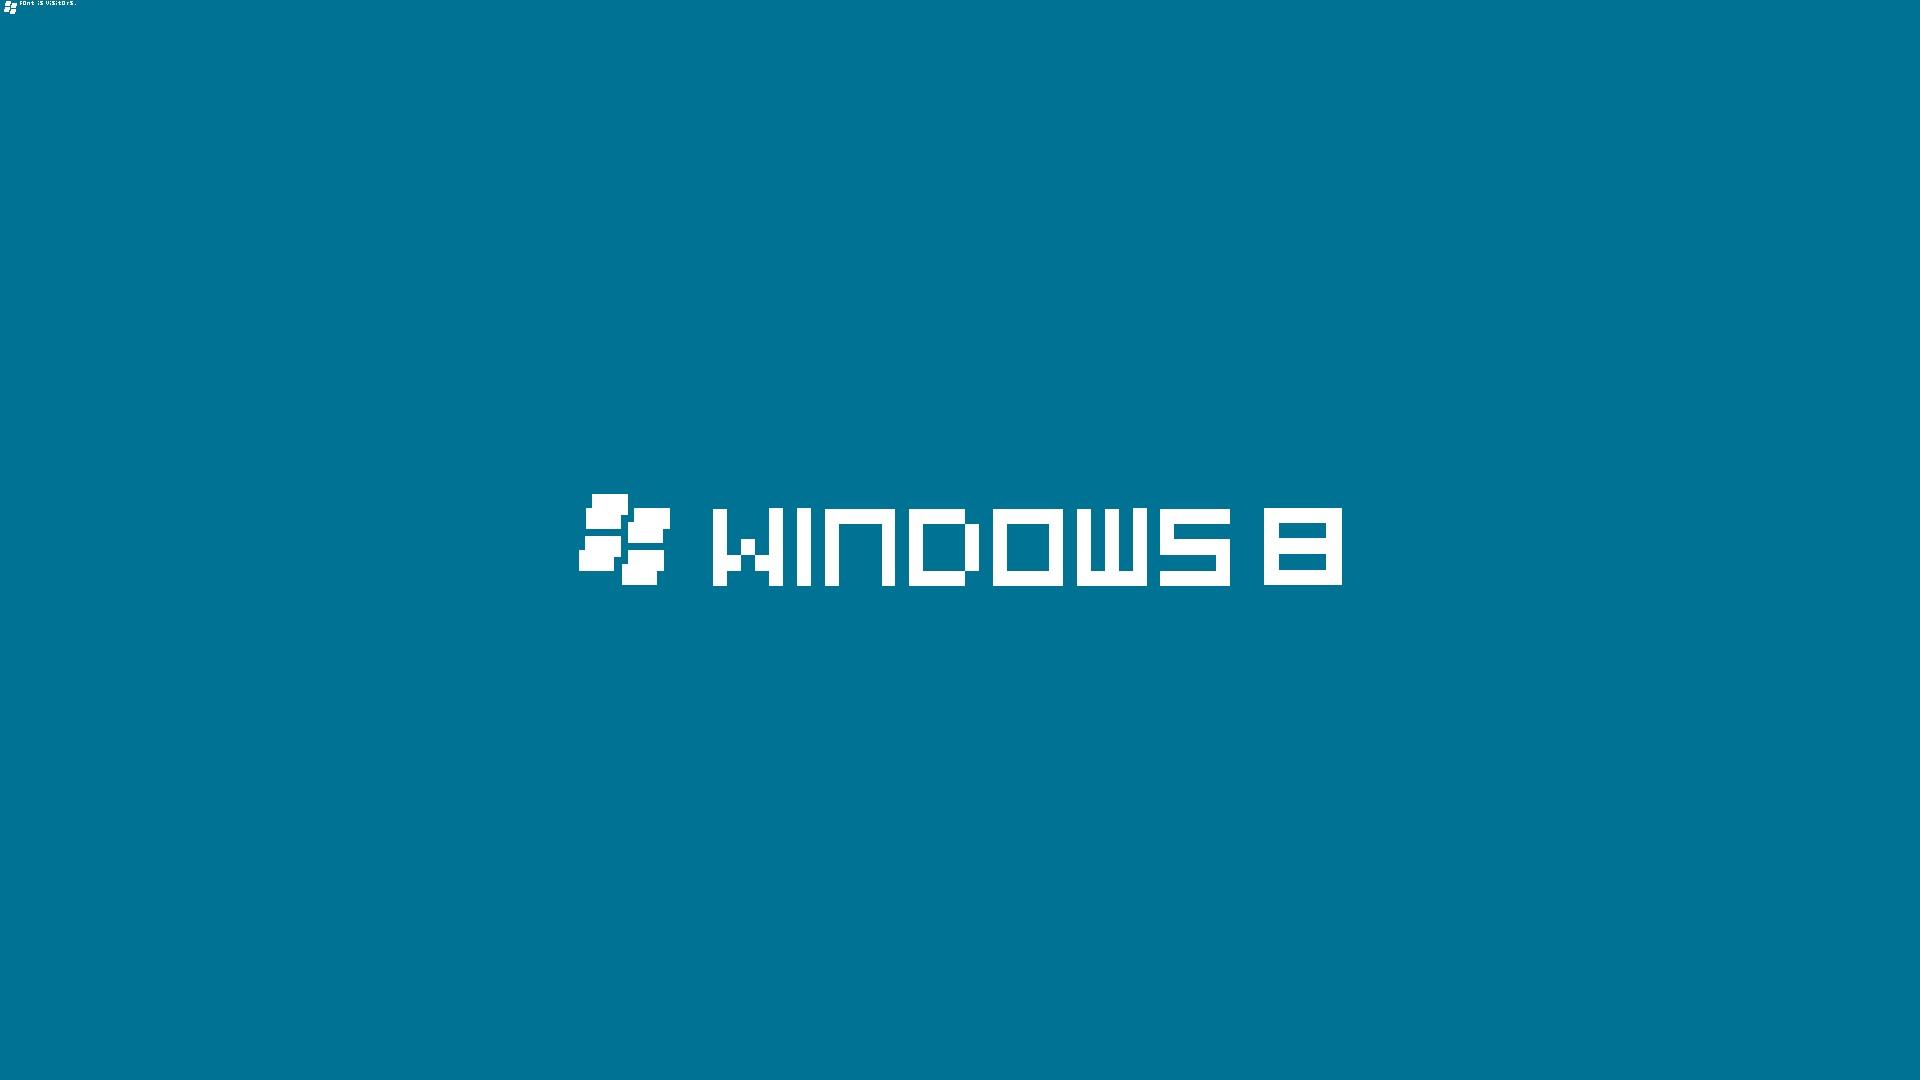 1920x1080 Windows 8 bit desktop PC and Mac wallpaper 1920x1080